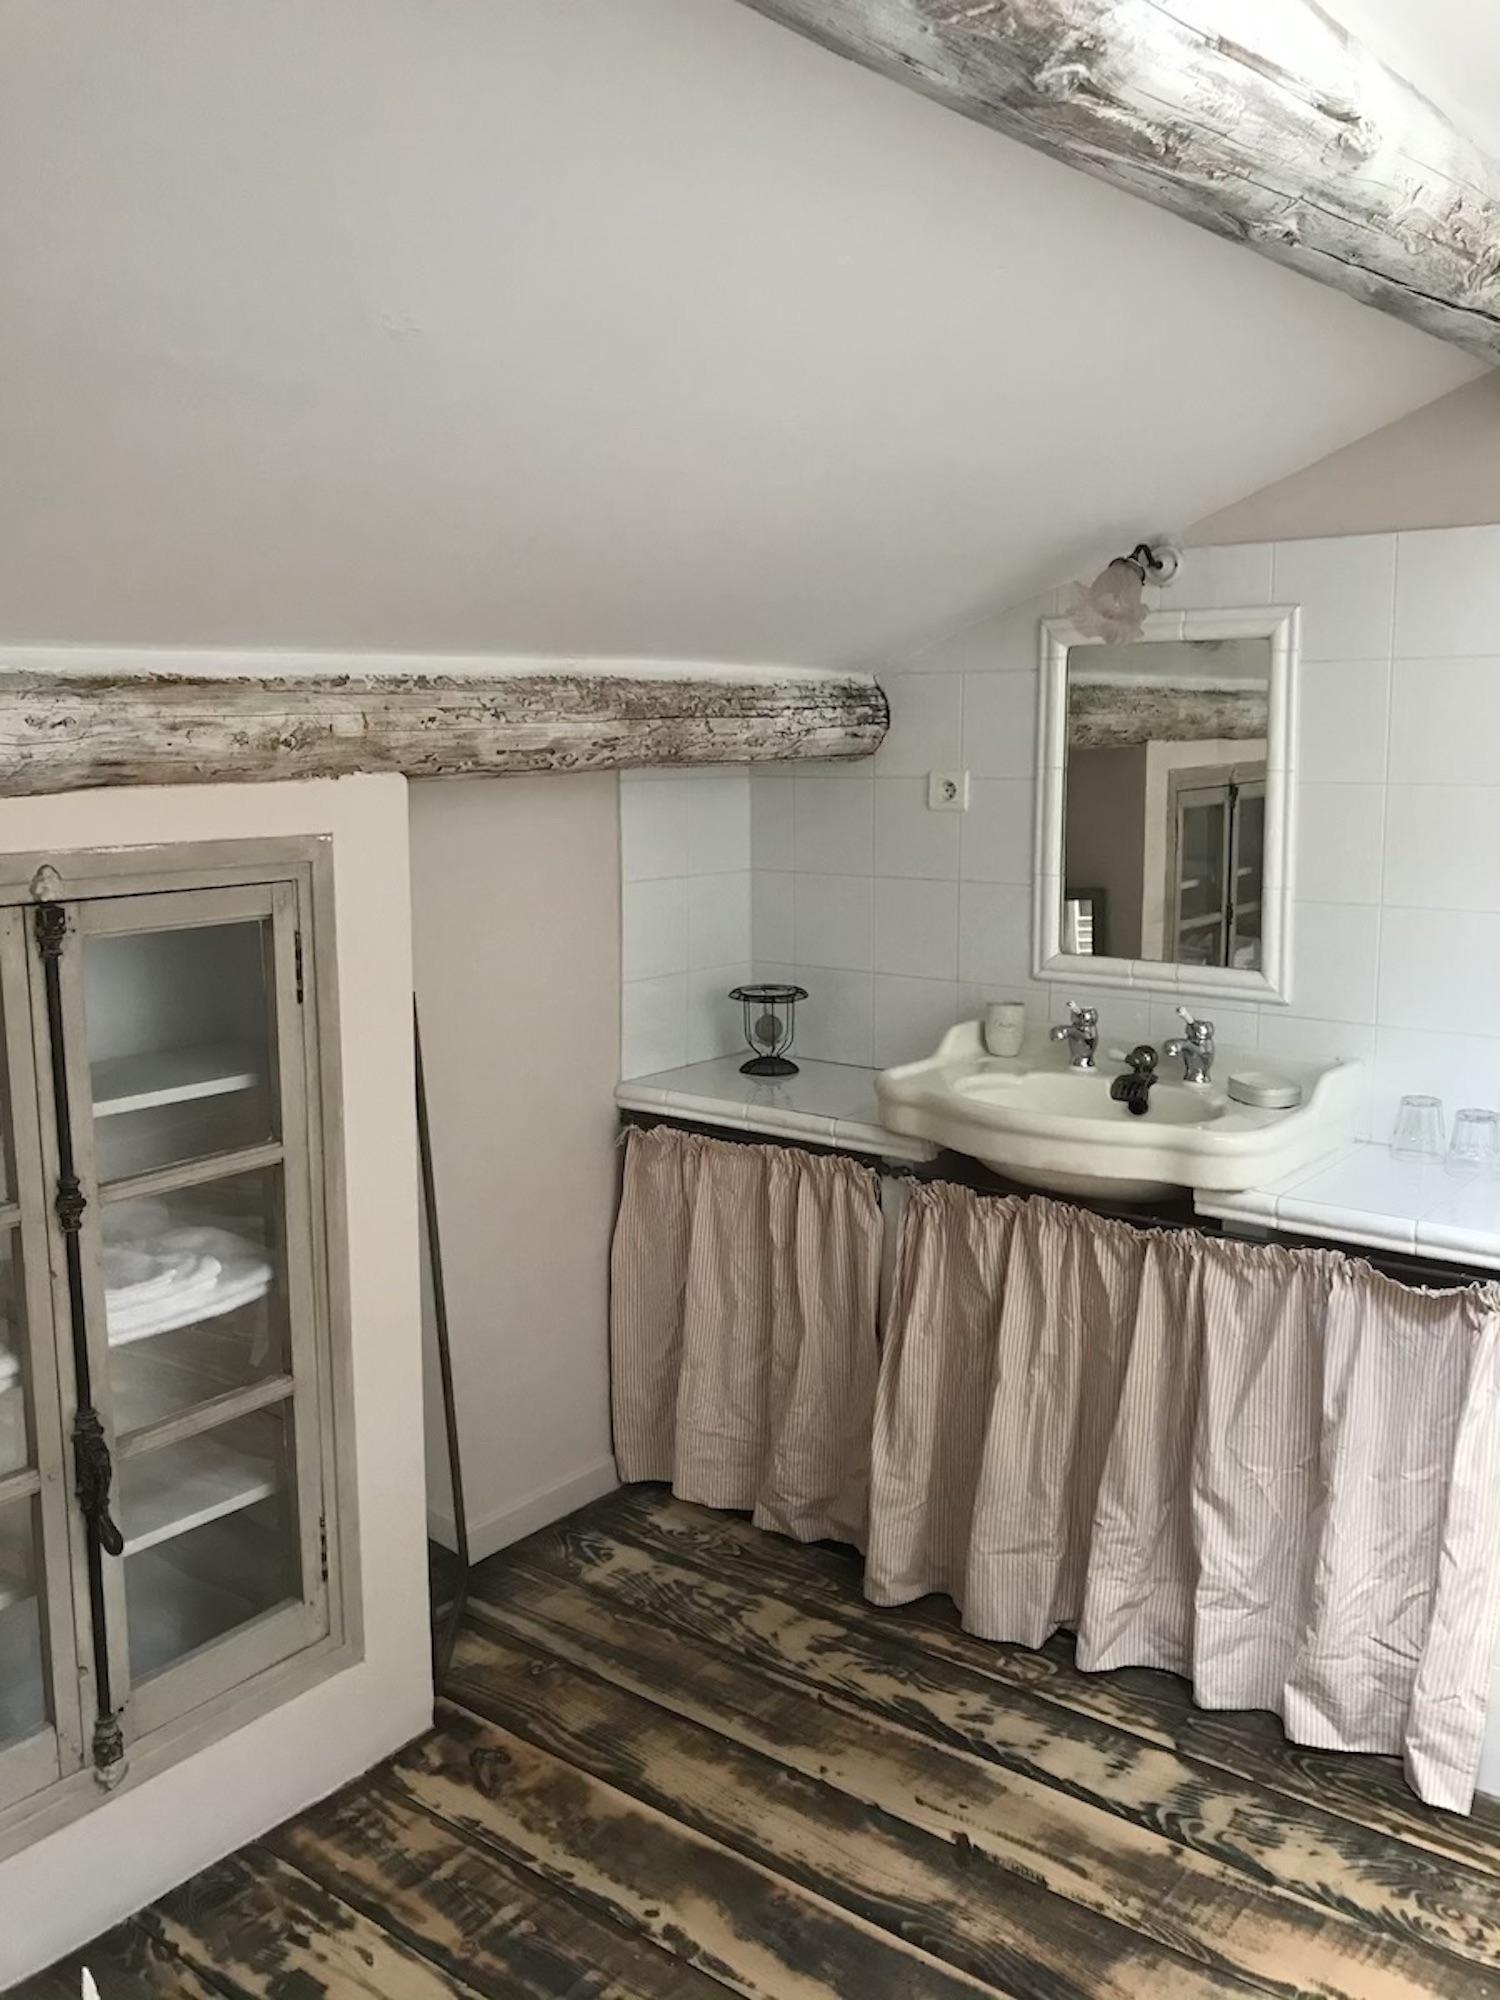 la bastide des songes - chambre hotes - luberon - provence - gordes - roussillon - charme - bed and breakfast - flanelle - salle de bain 2